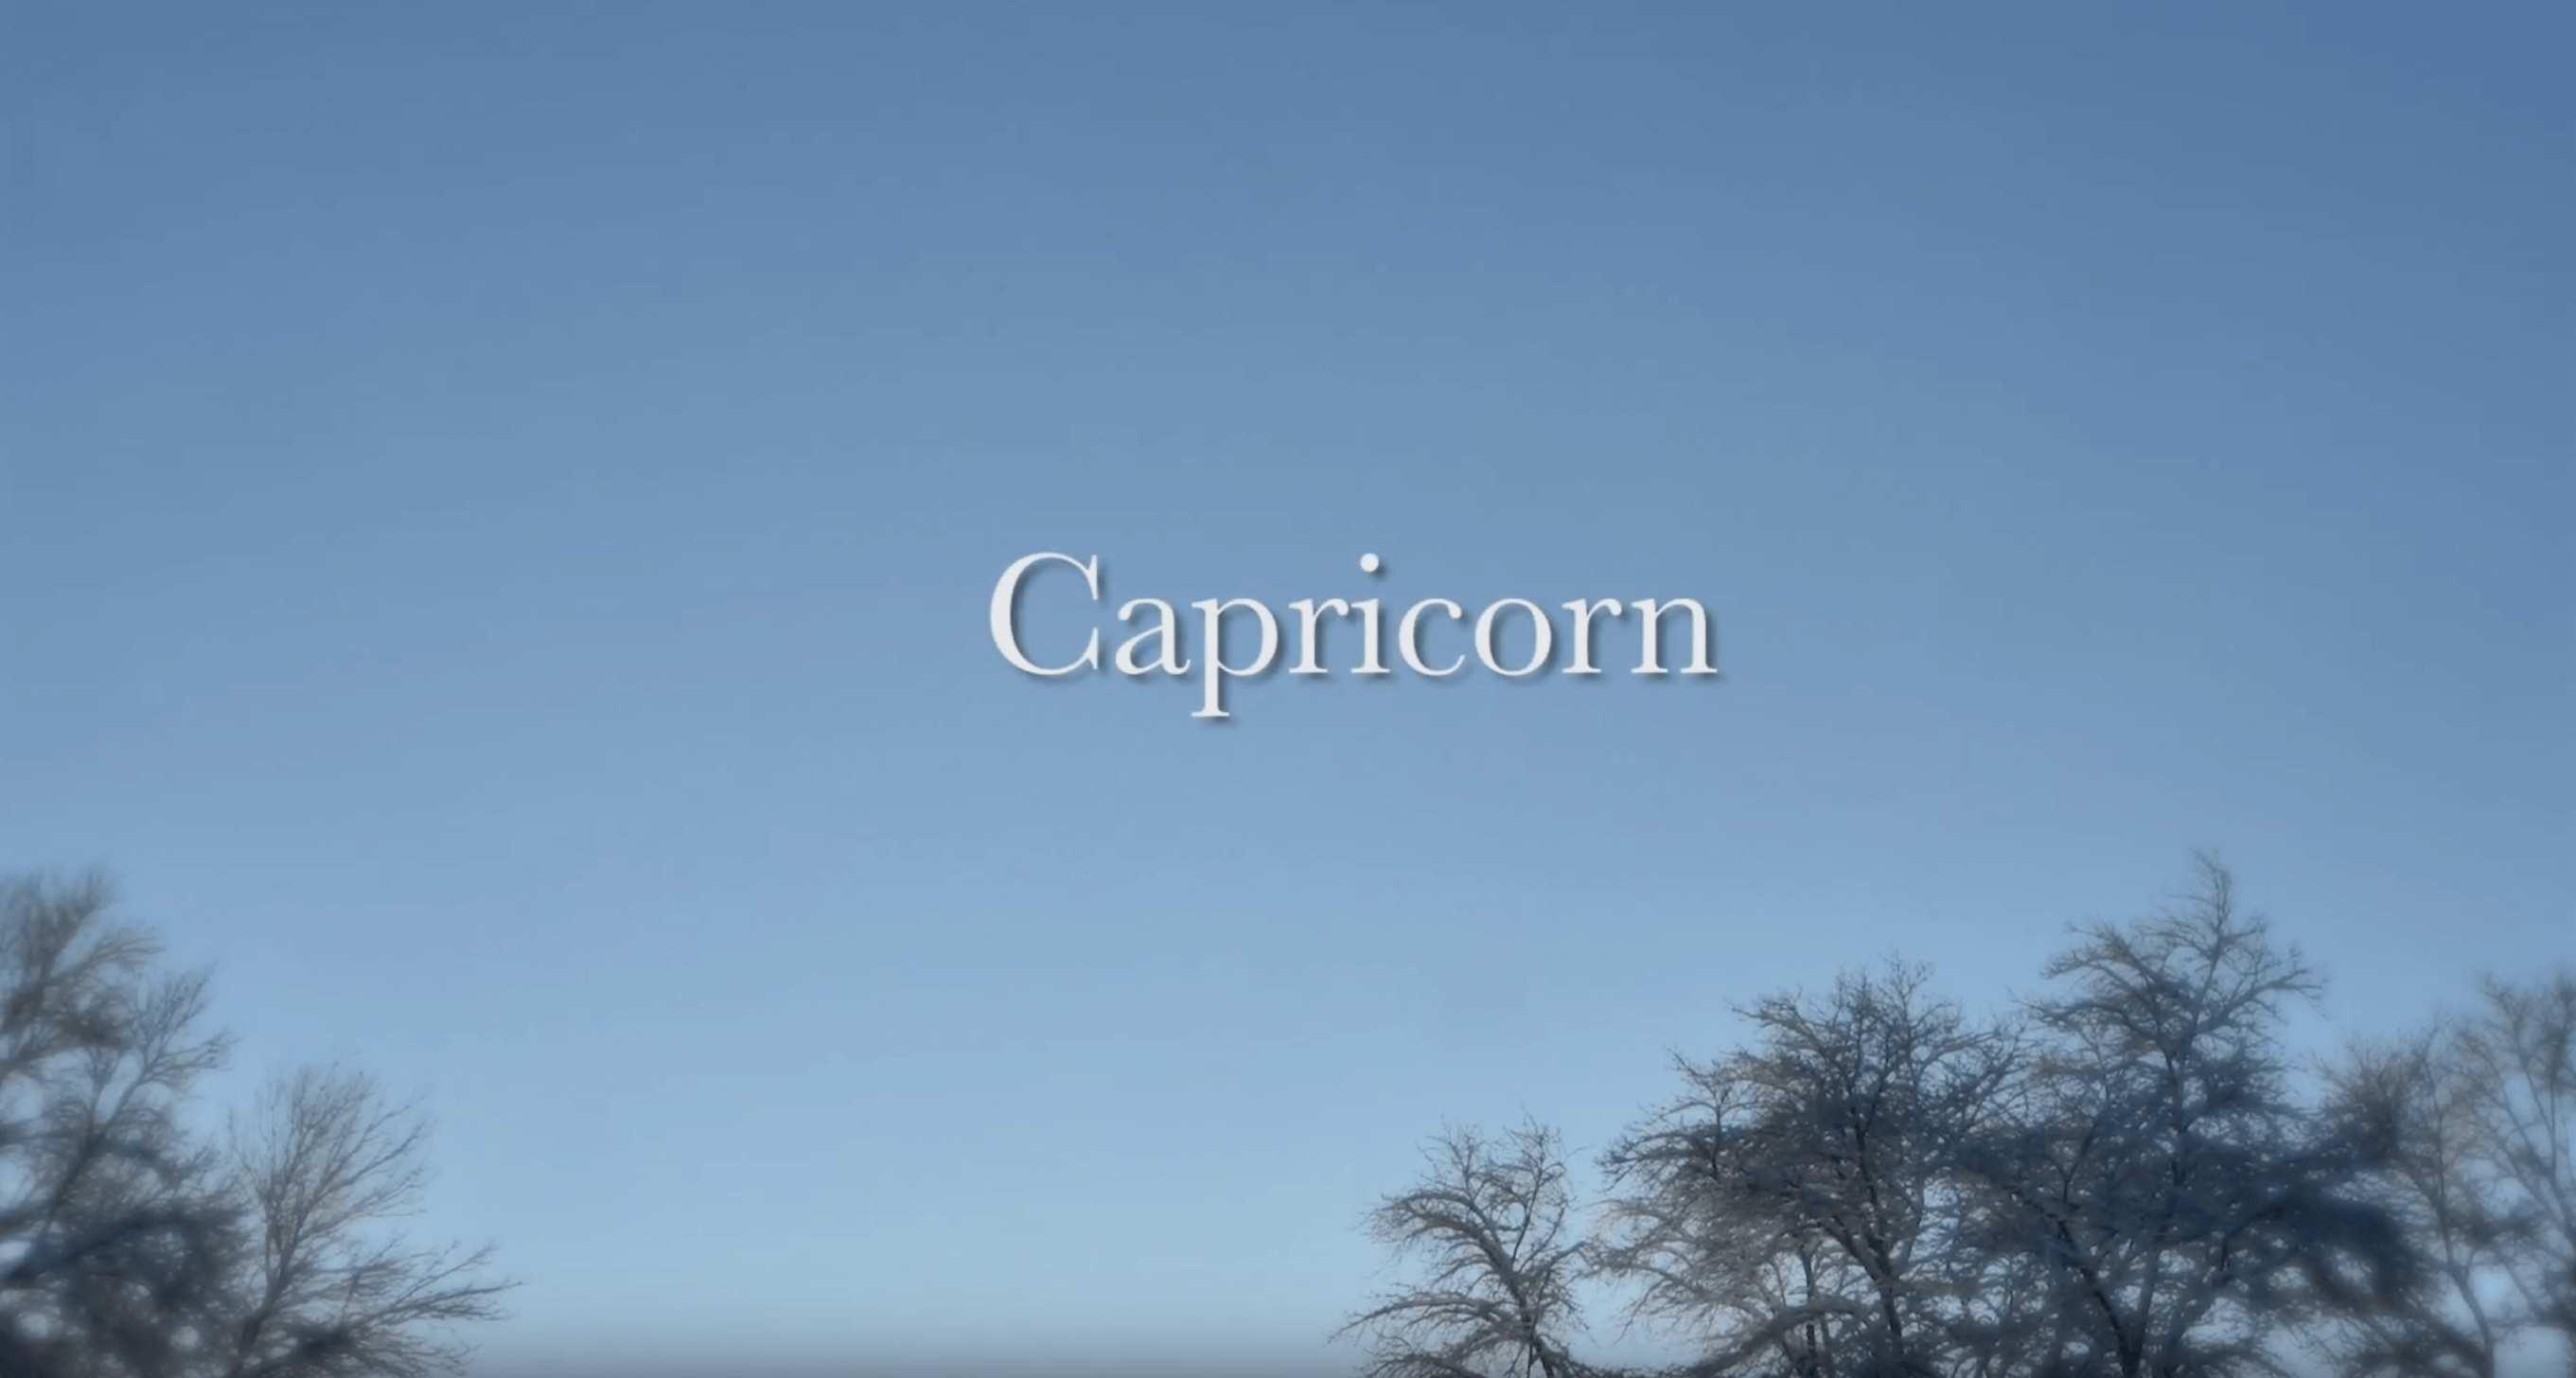 capricorn-screenshot-martha-brill